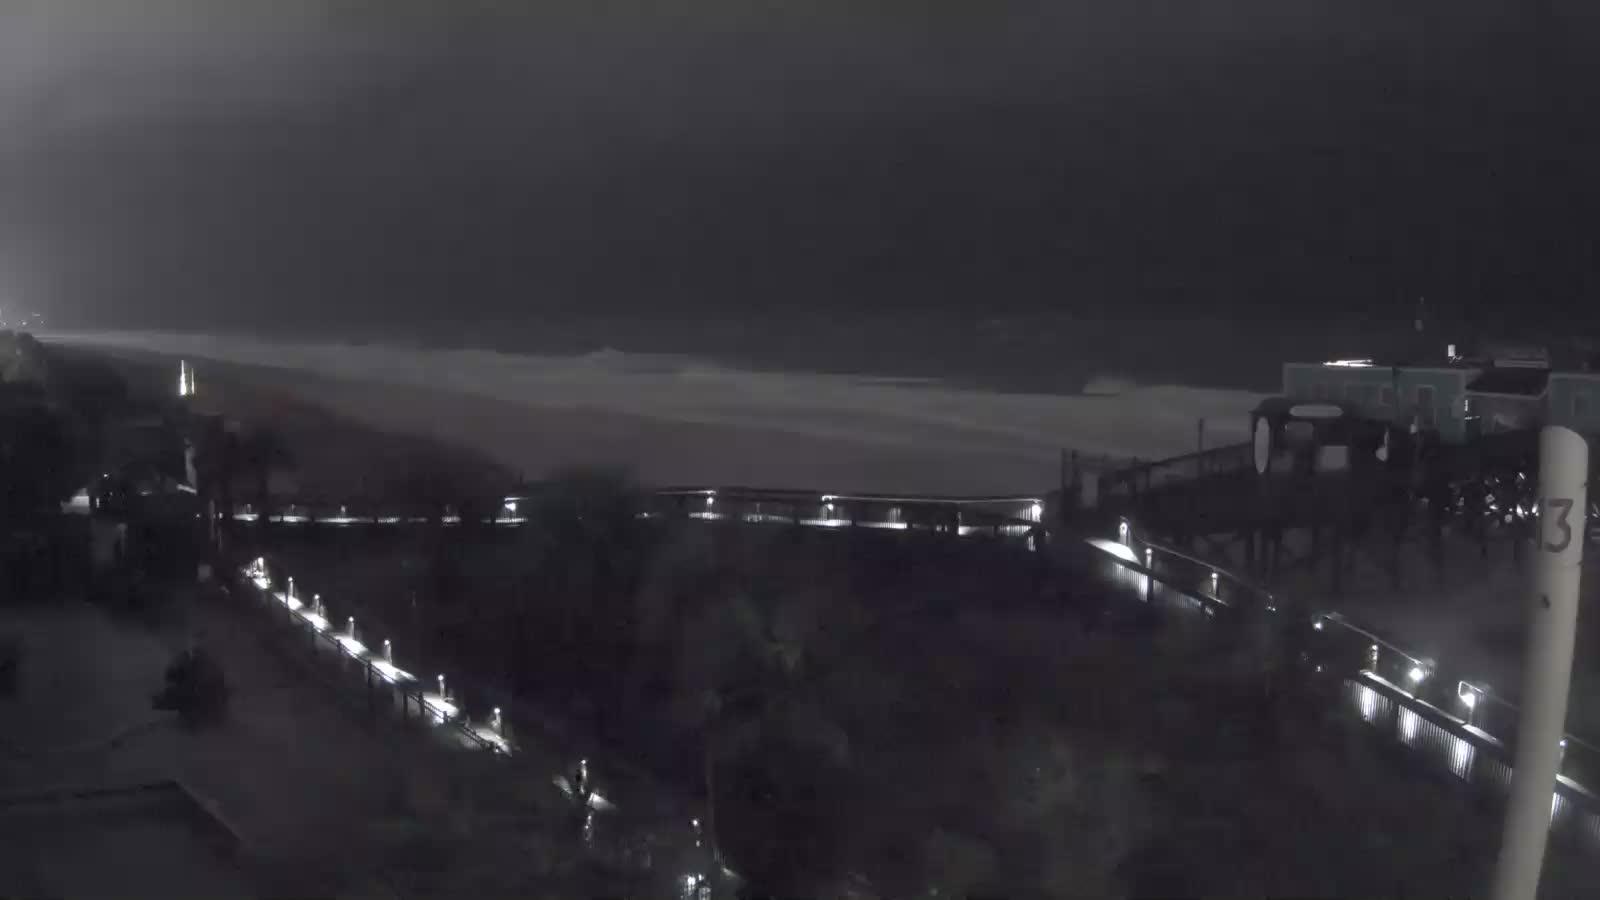 Riptydz Myrtle Beach Webcam Recording for Florence Approach (2018)